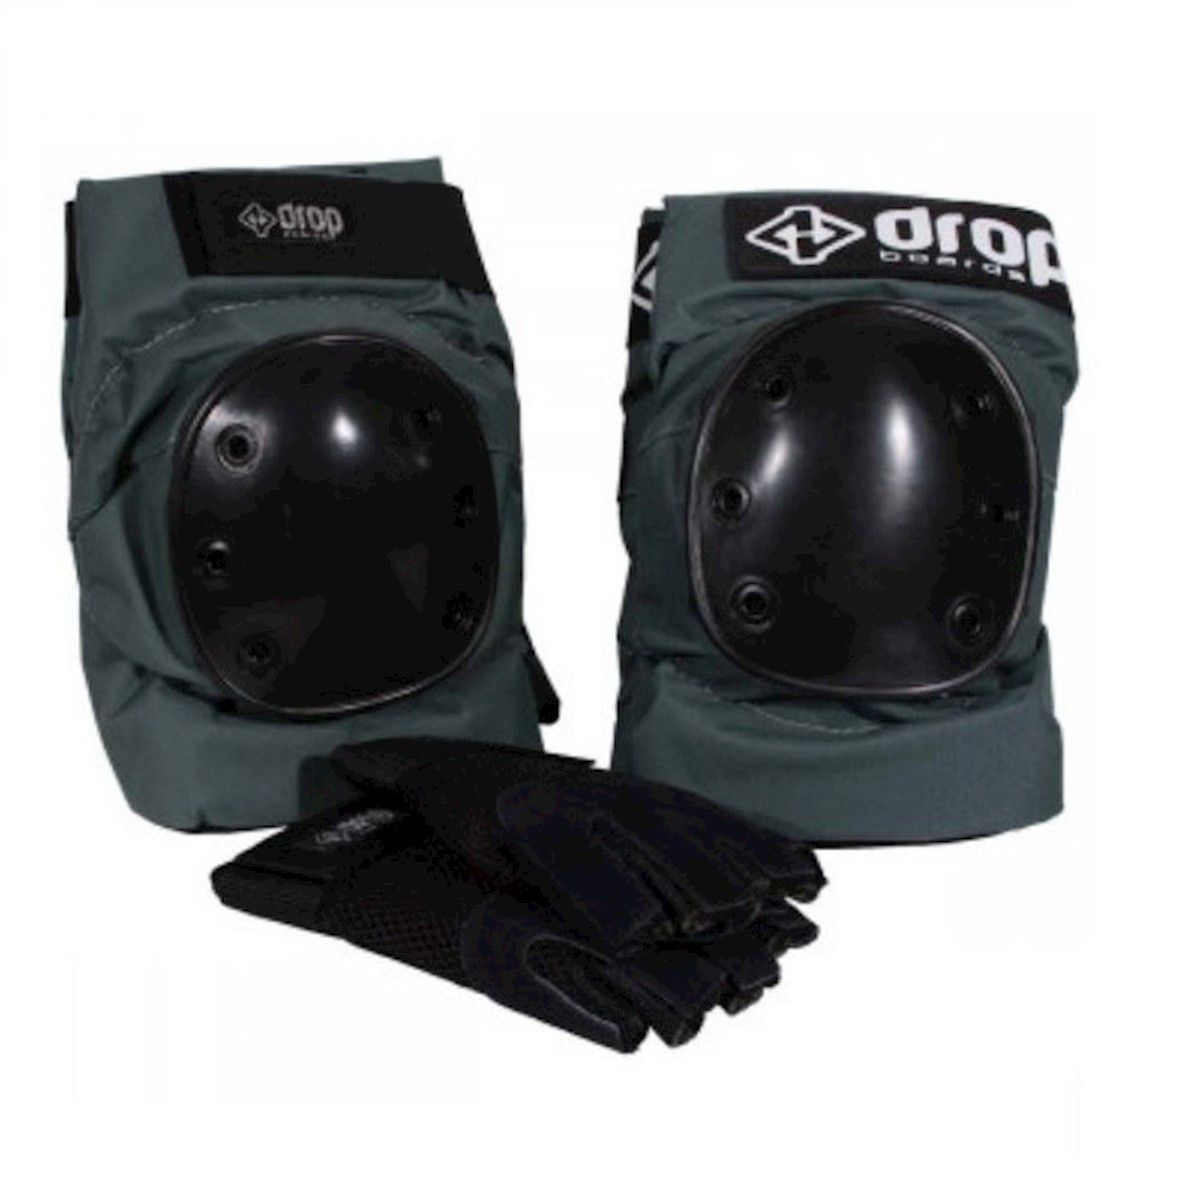 Kit Proteção DropBoards Carve Verde/preto